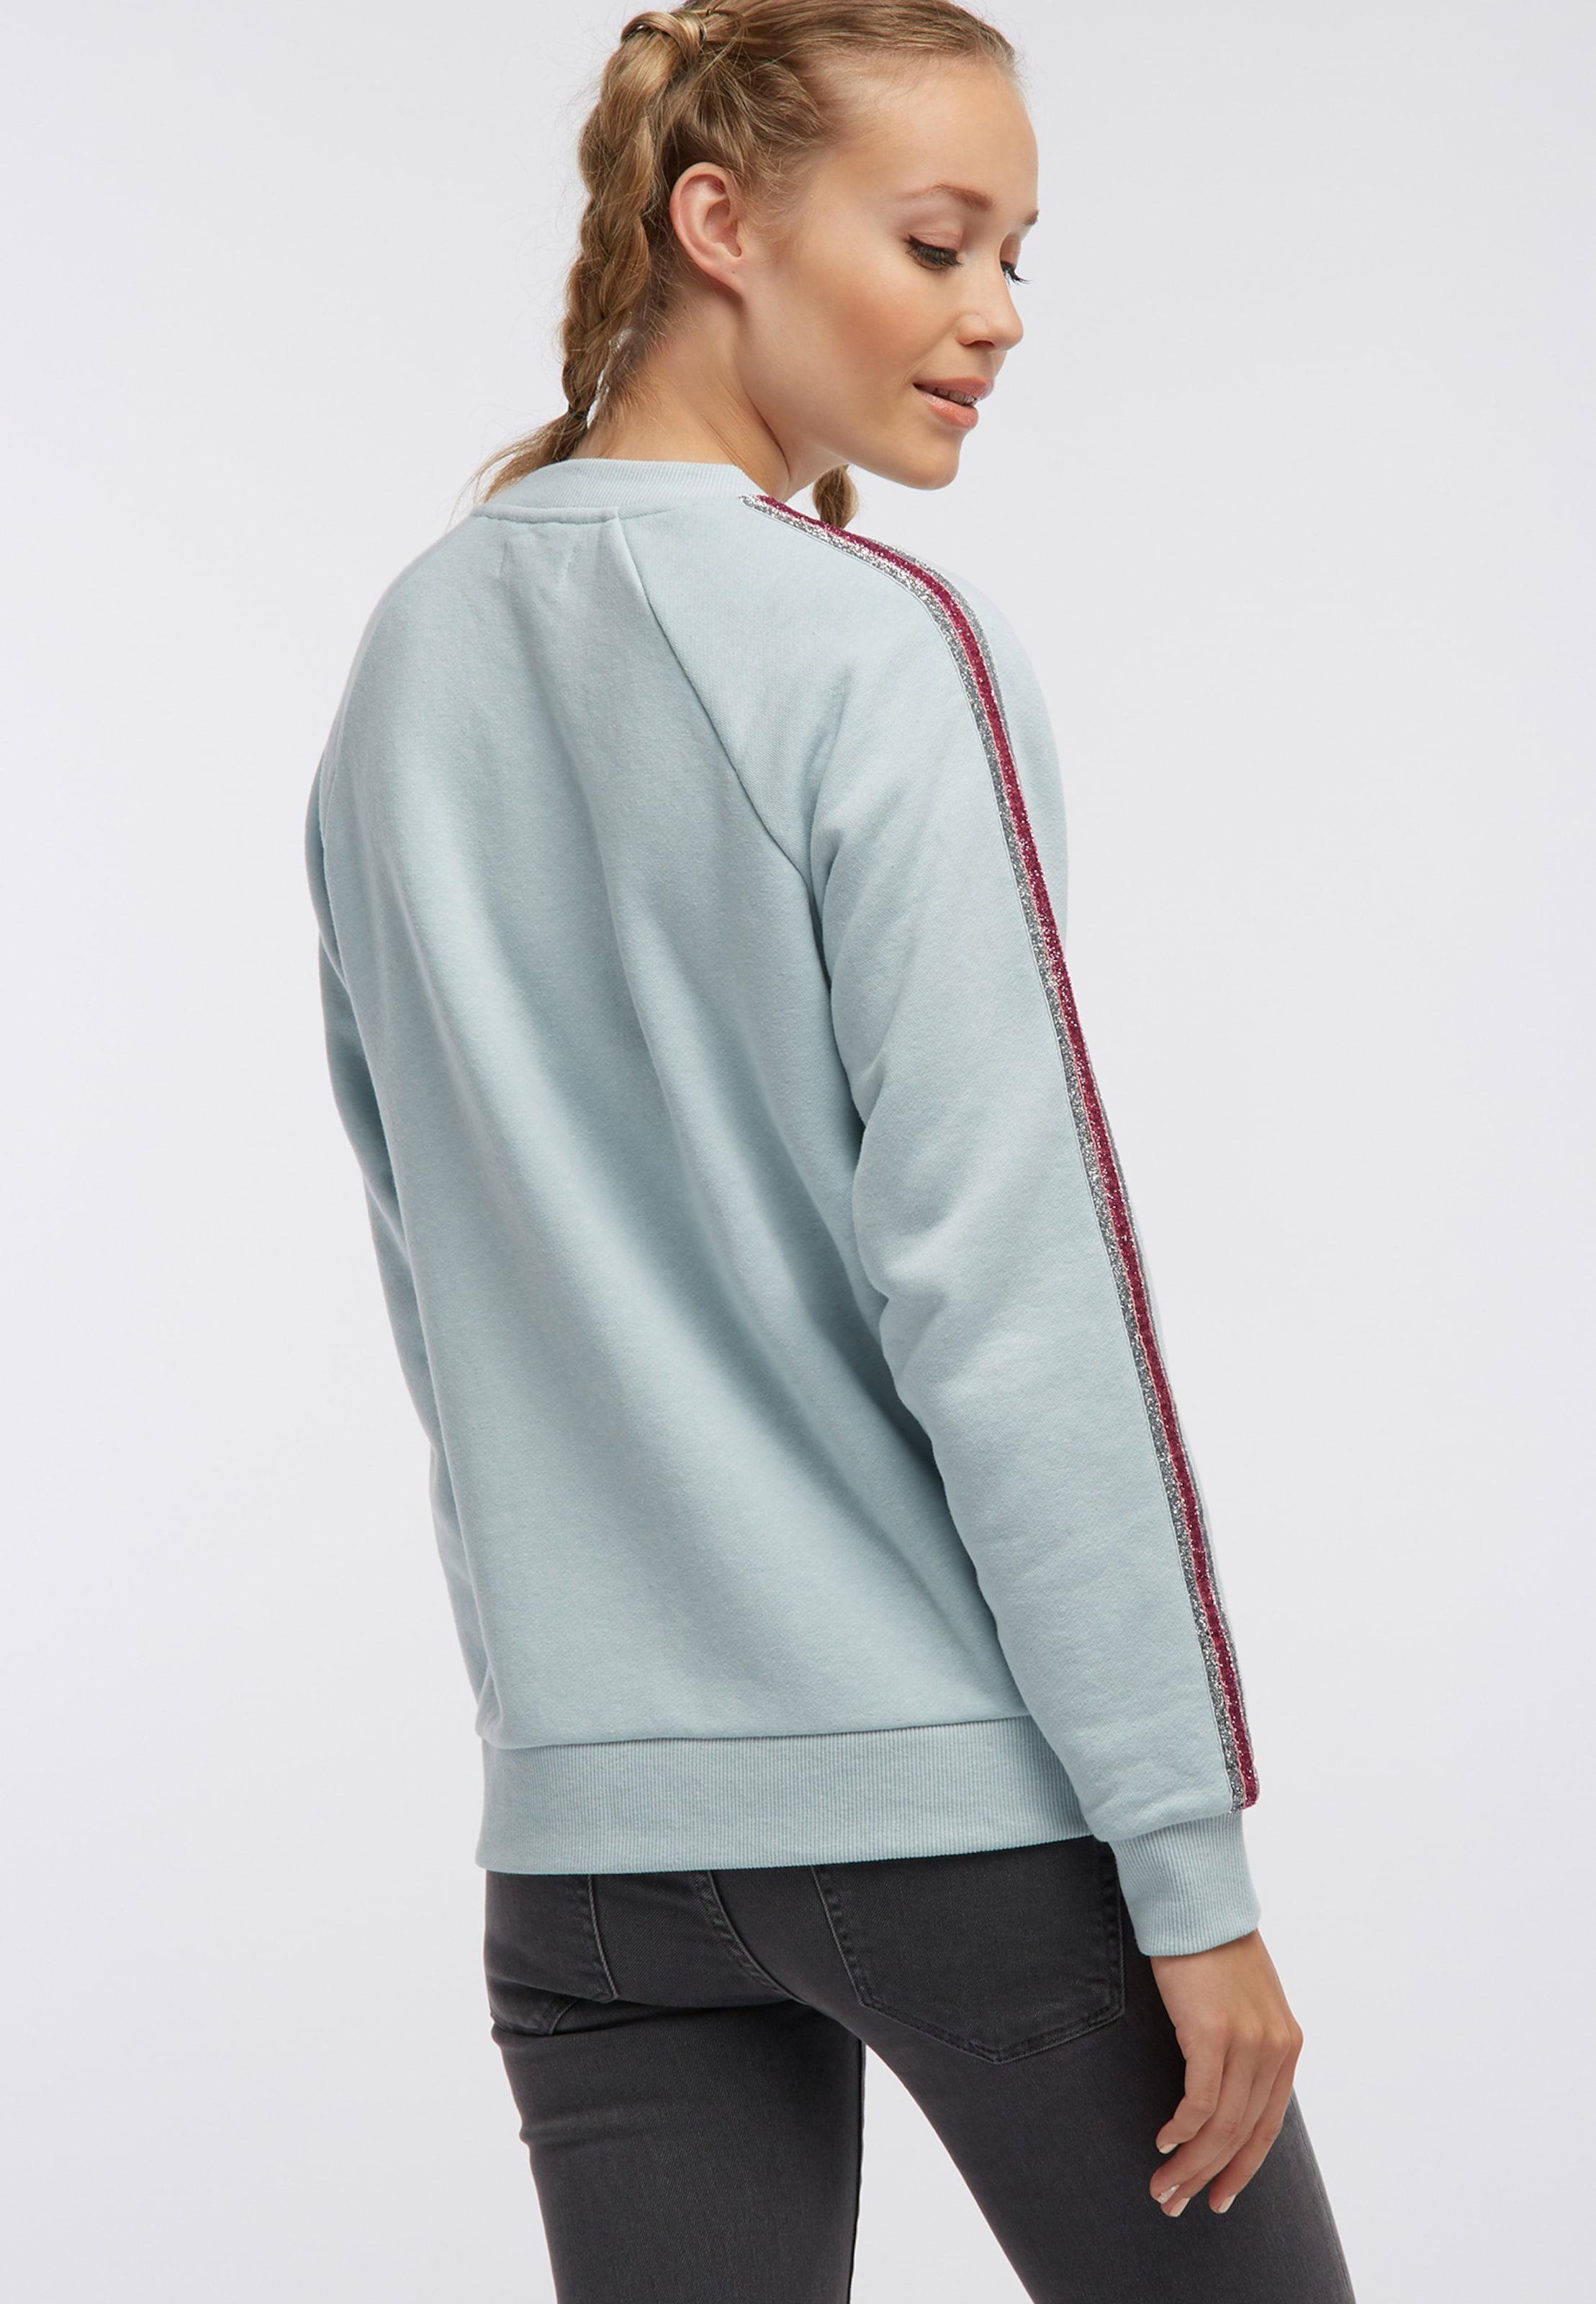 Mymo Sweatshirt In Sweatshirt Mint Mymo Mint Sweatshirt In Mint Mymo Mymo In In Sweatshirt 8n0NvmOw